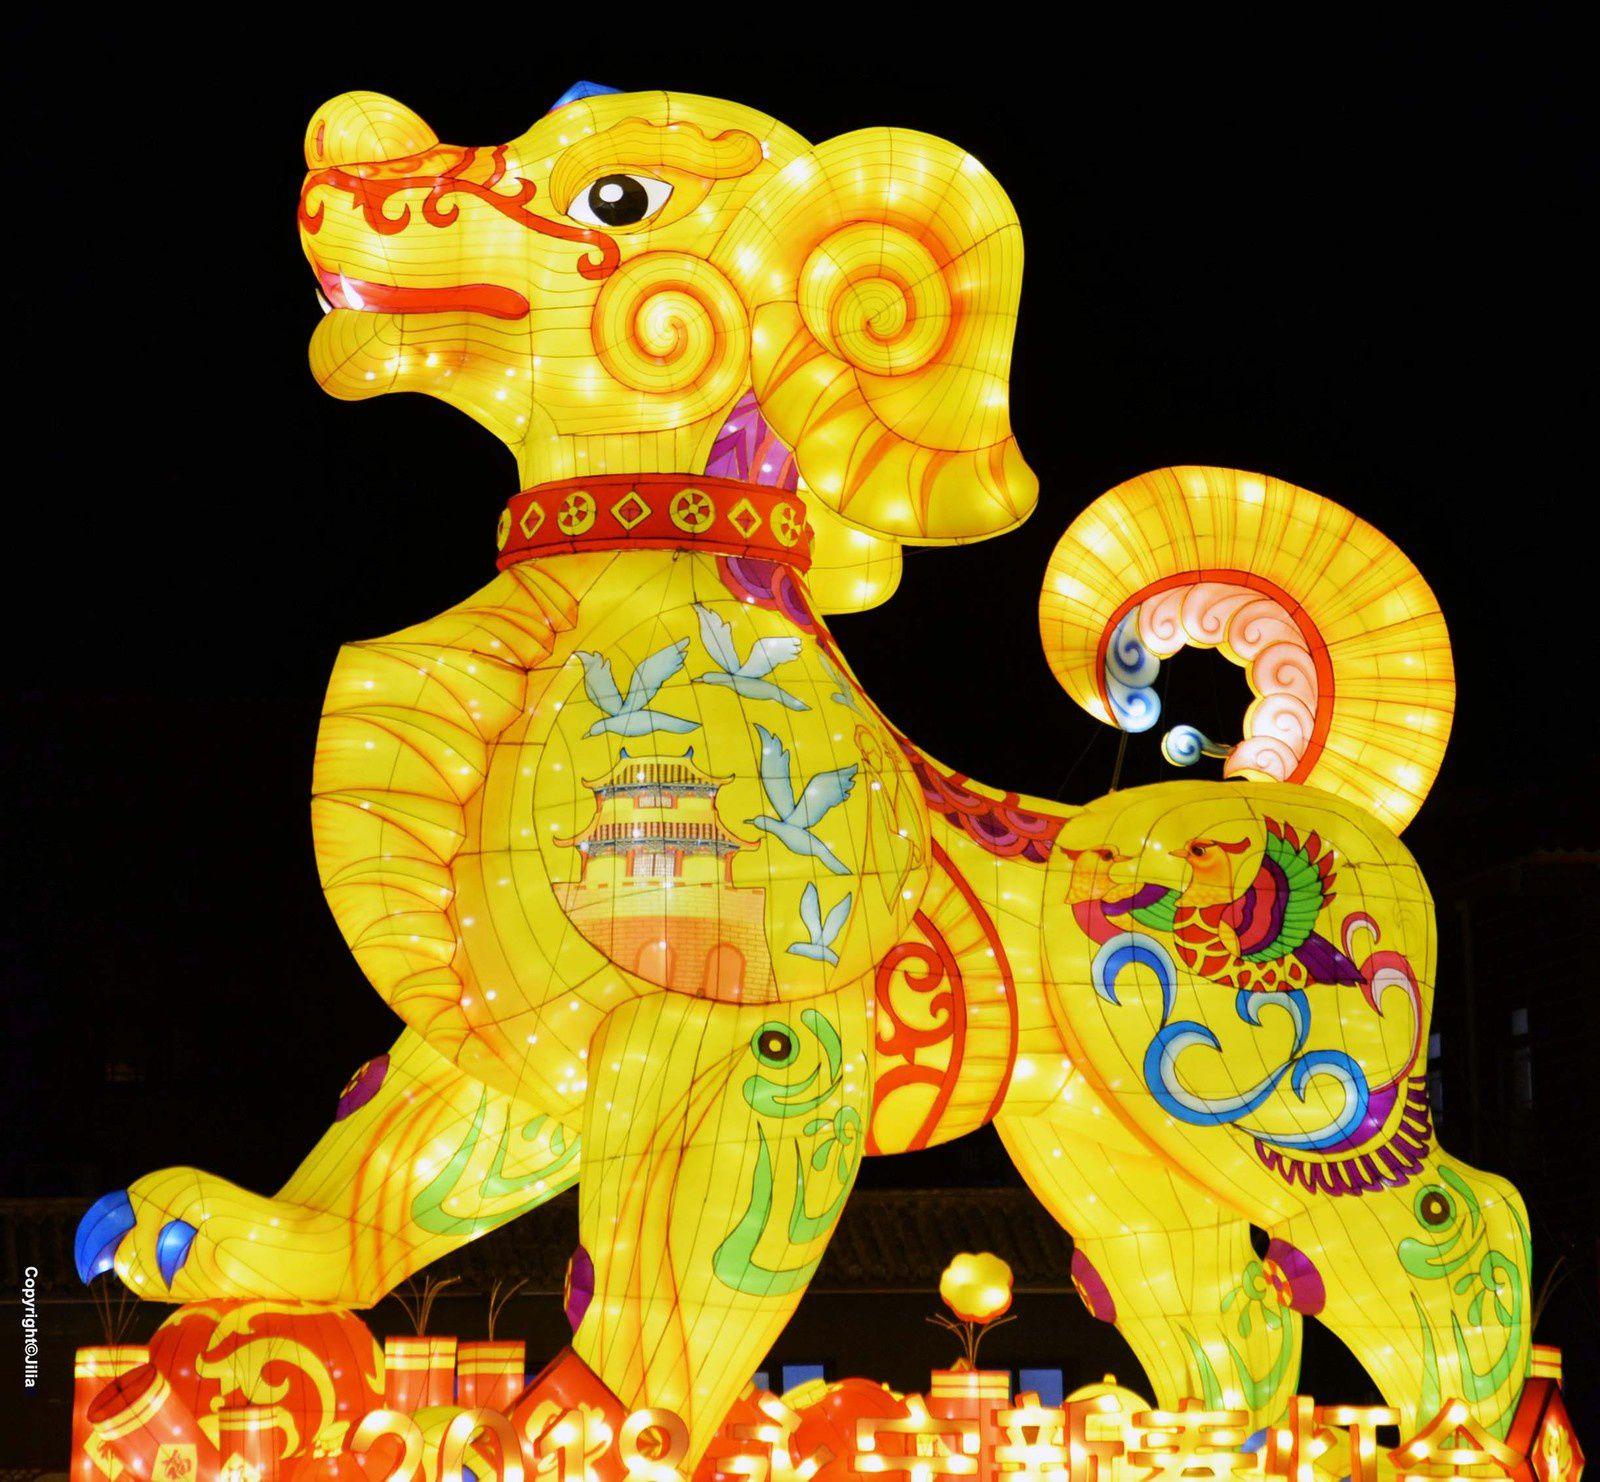 La Fête des Lanternes à Yongning - 永宁的元宵节